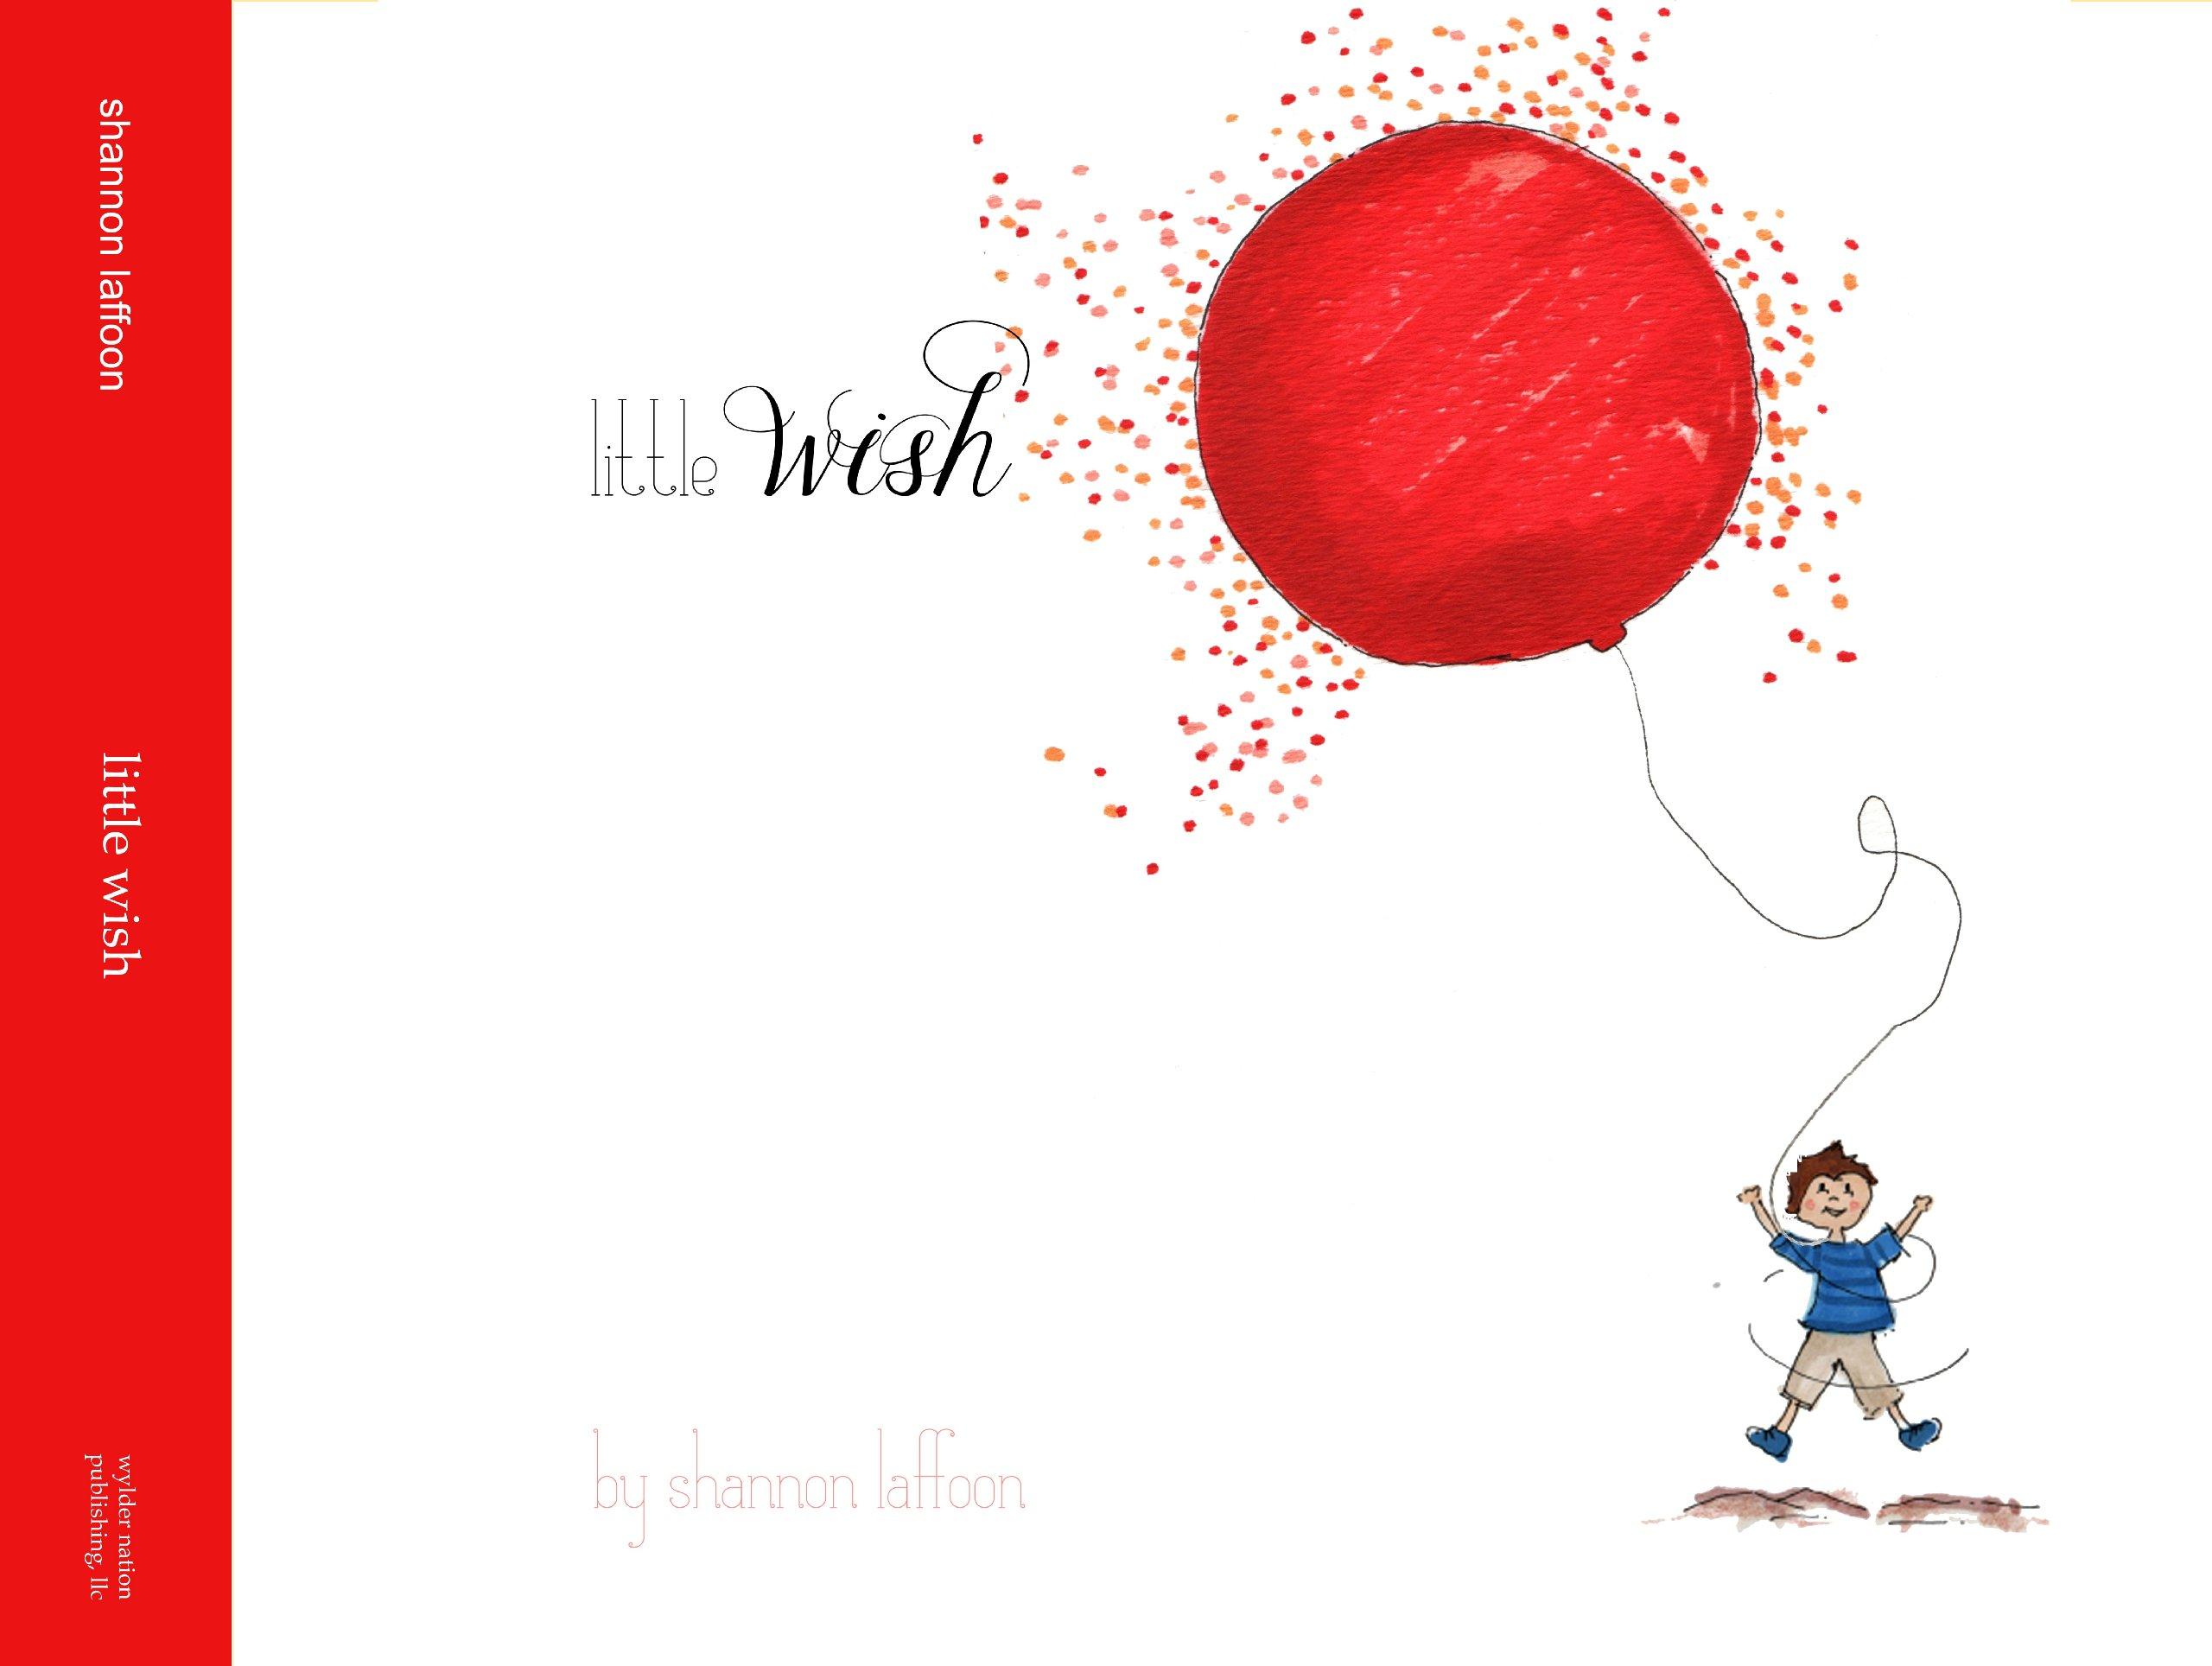 Little Wish